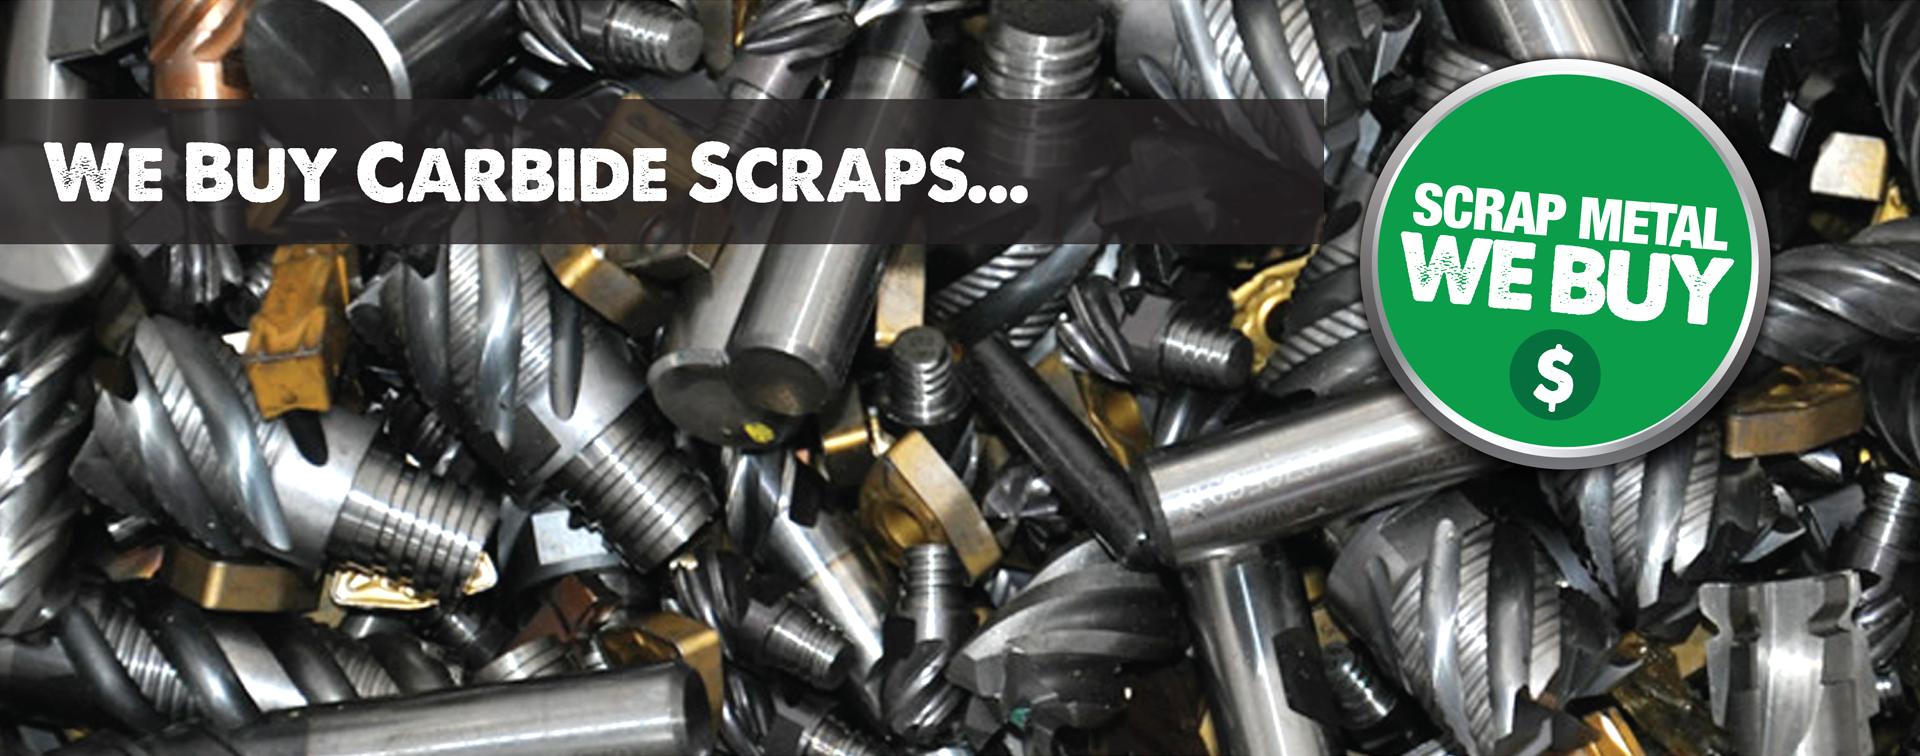 Carbide Scraps